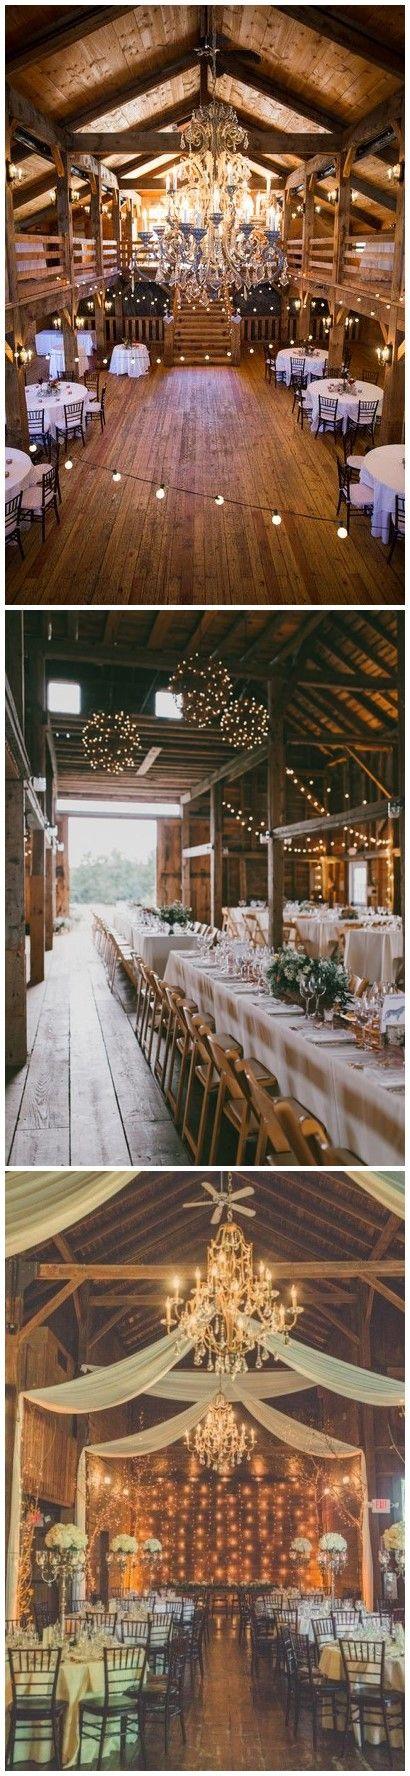 Lugares rústicos para bodas en otoño soñadas.